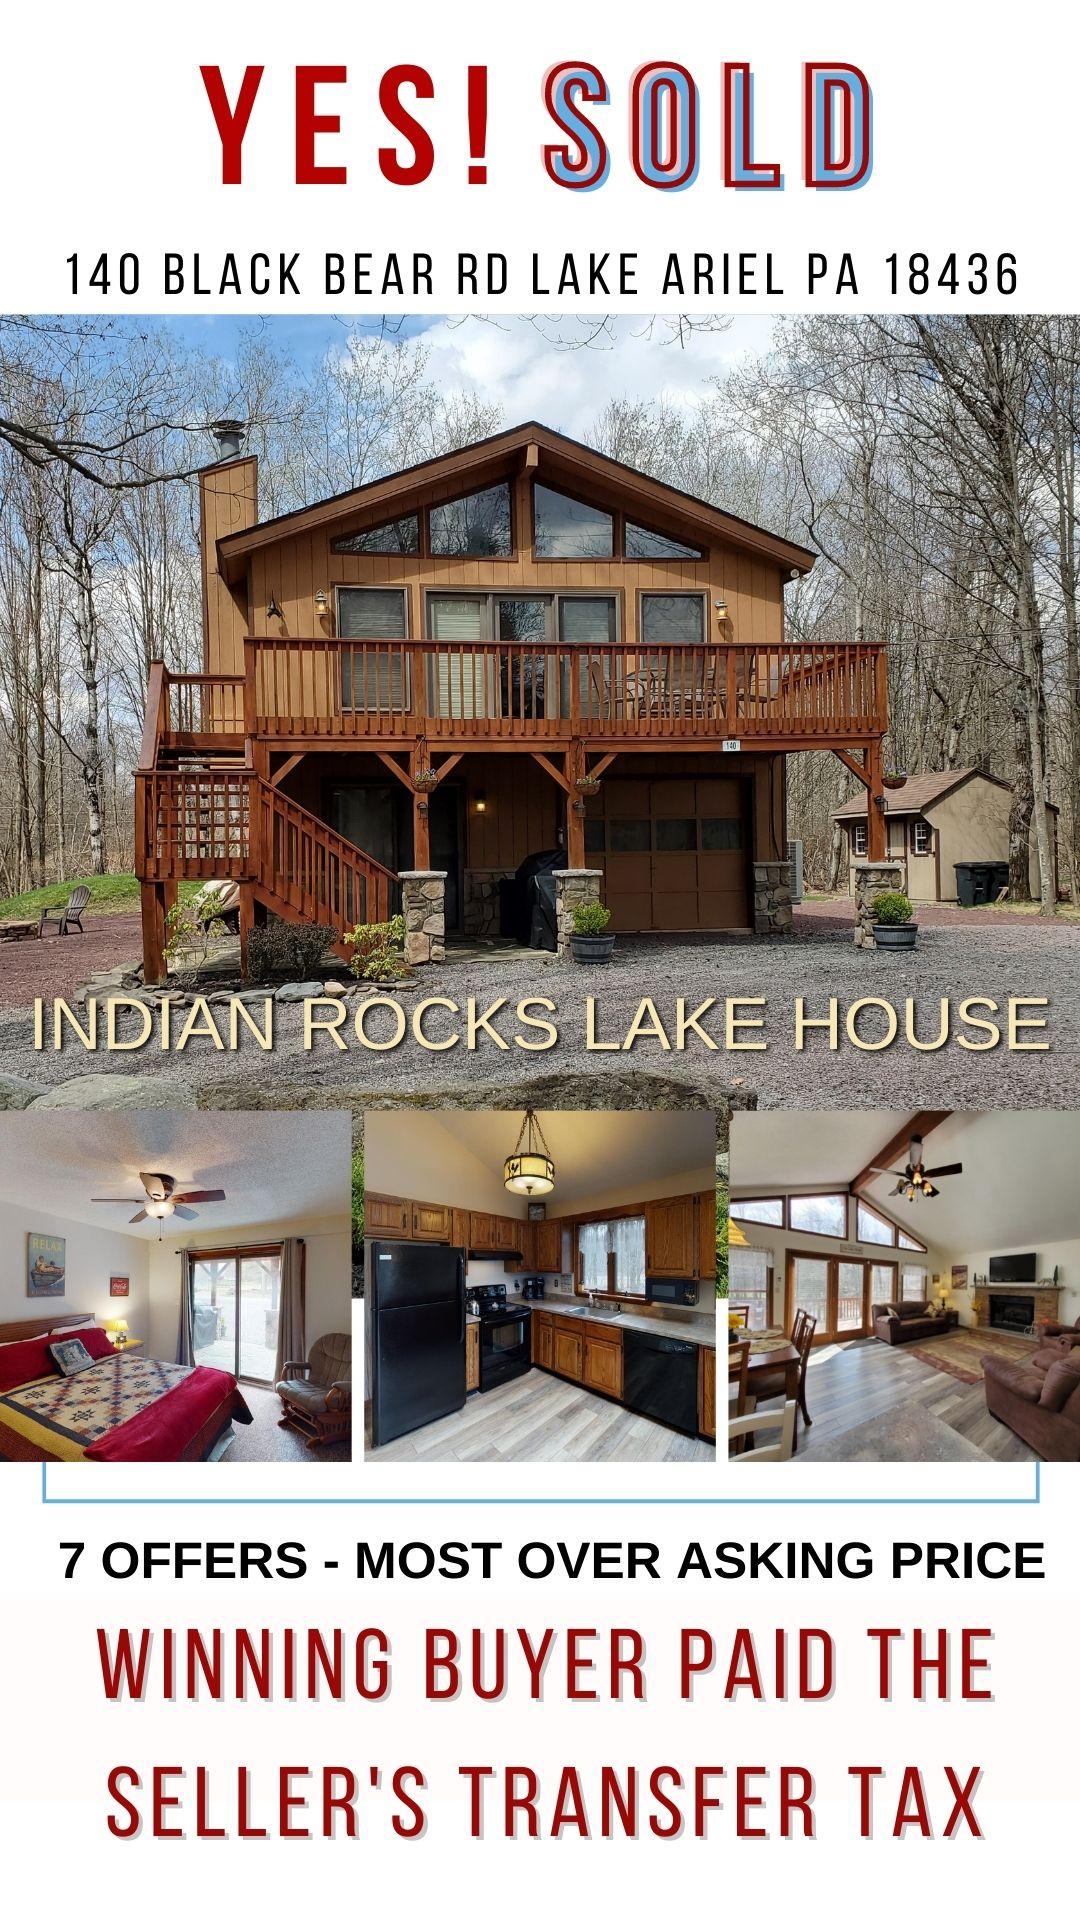 Indian Rocks Lake House Sold Summer 2021